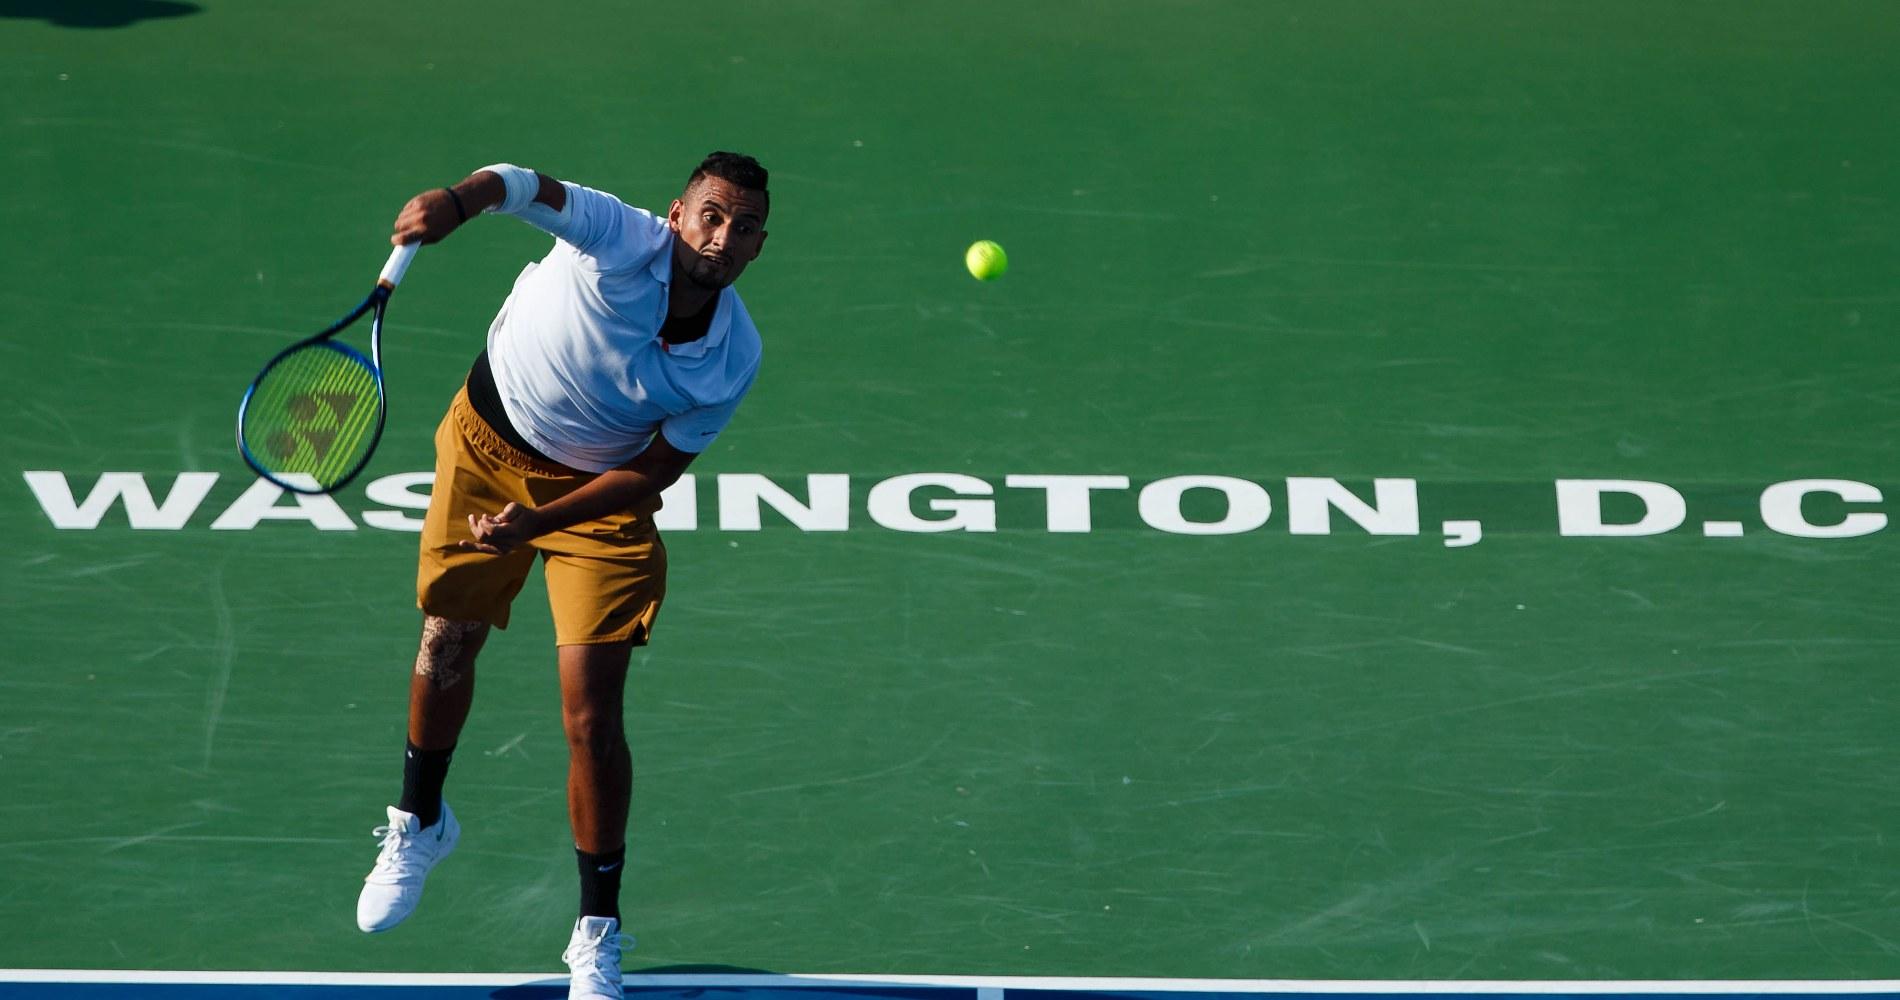 Washington - ATP